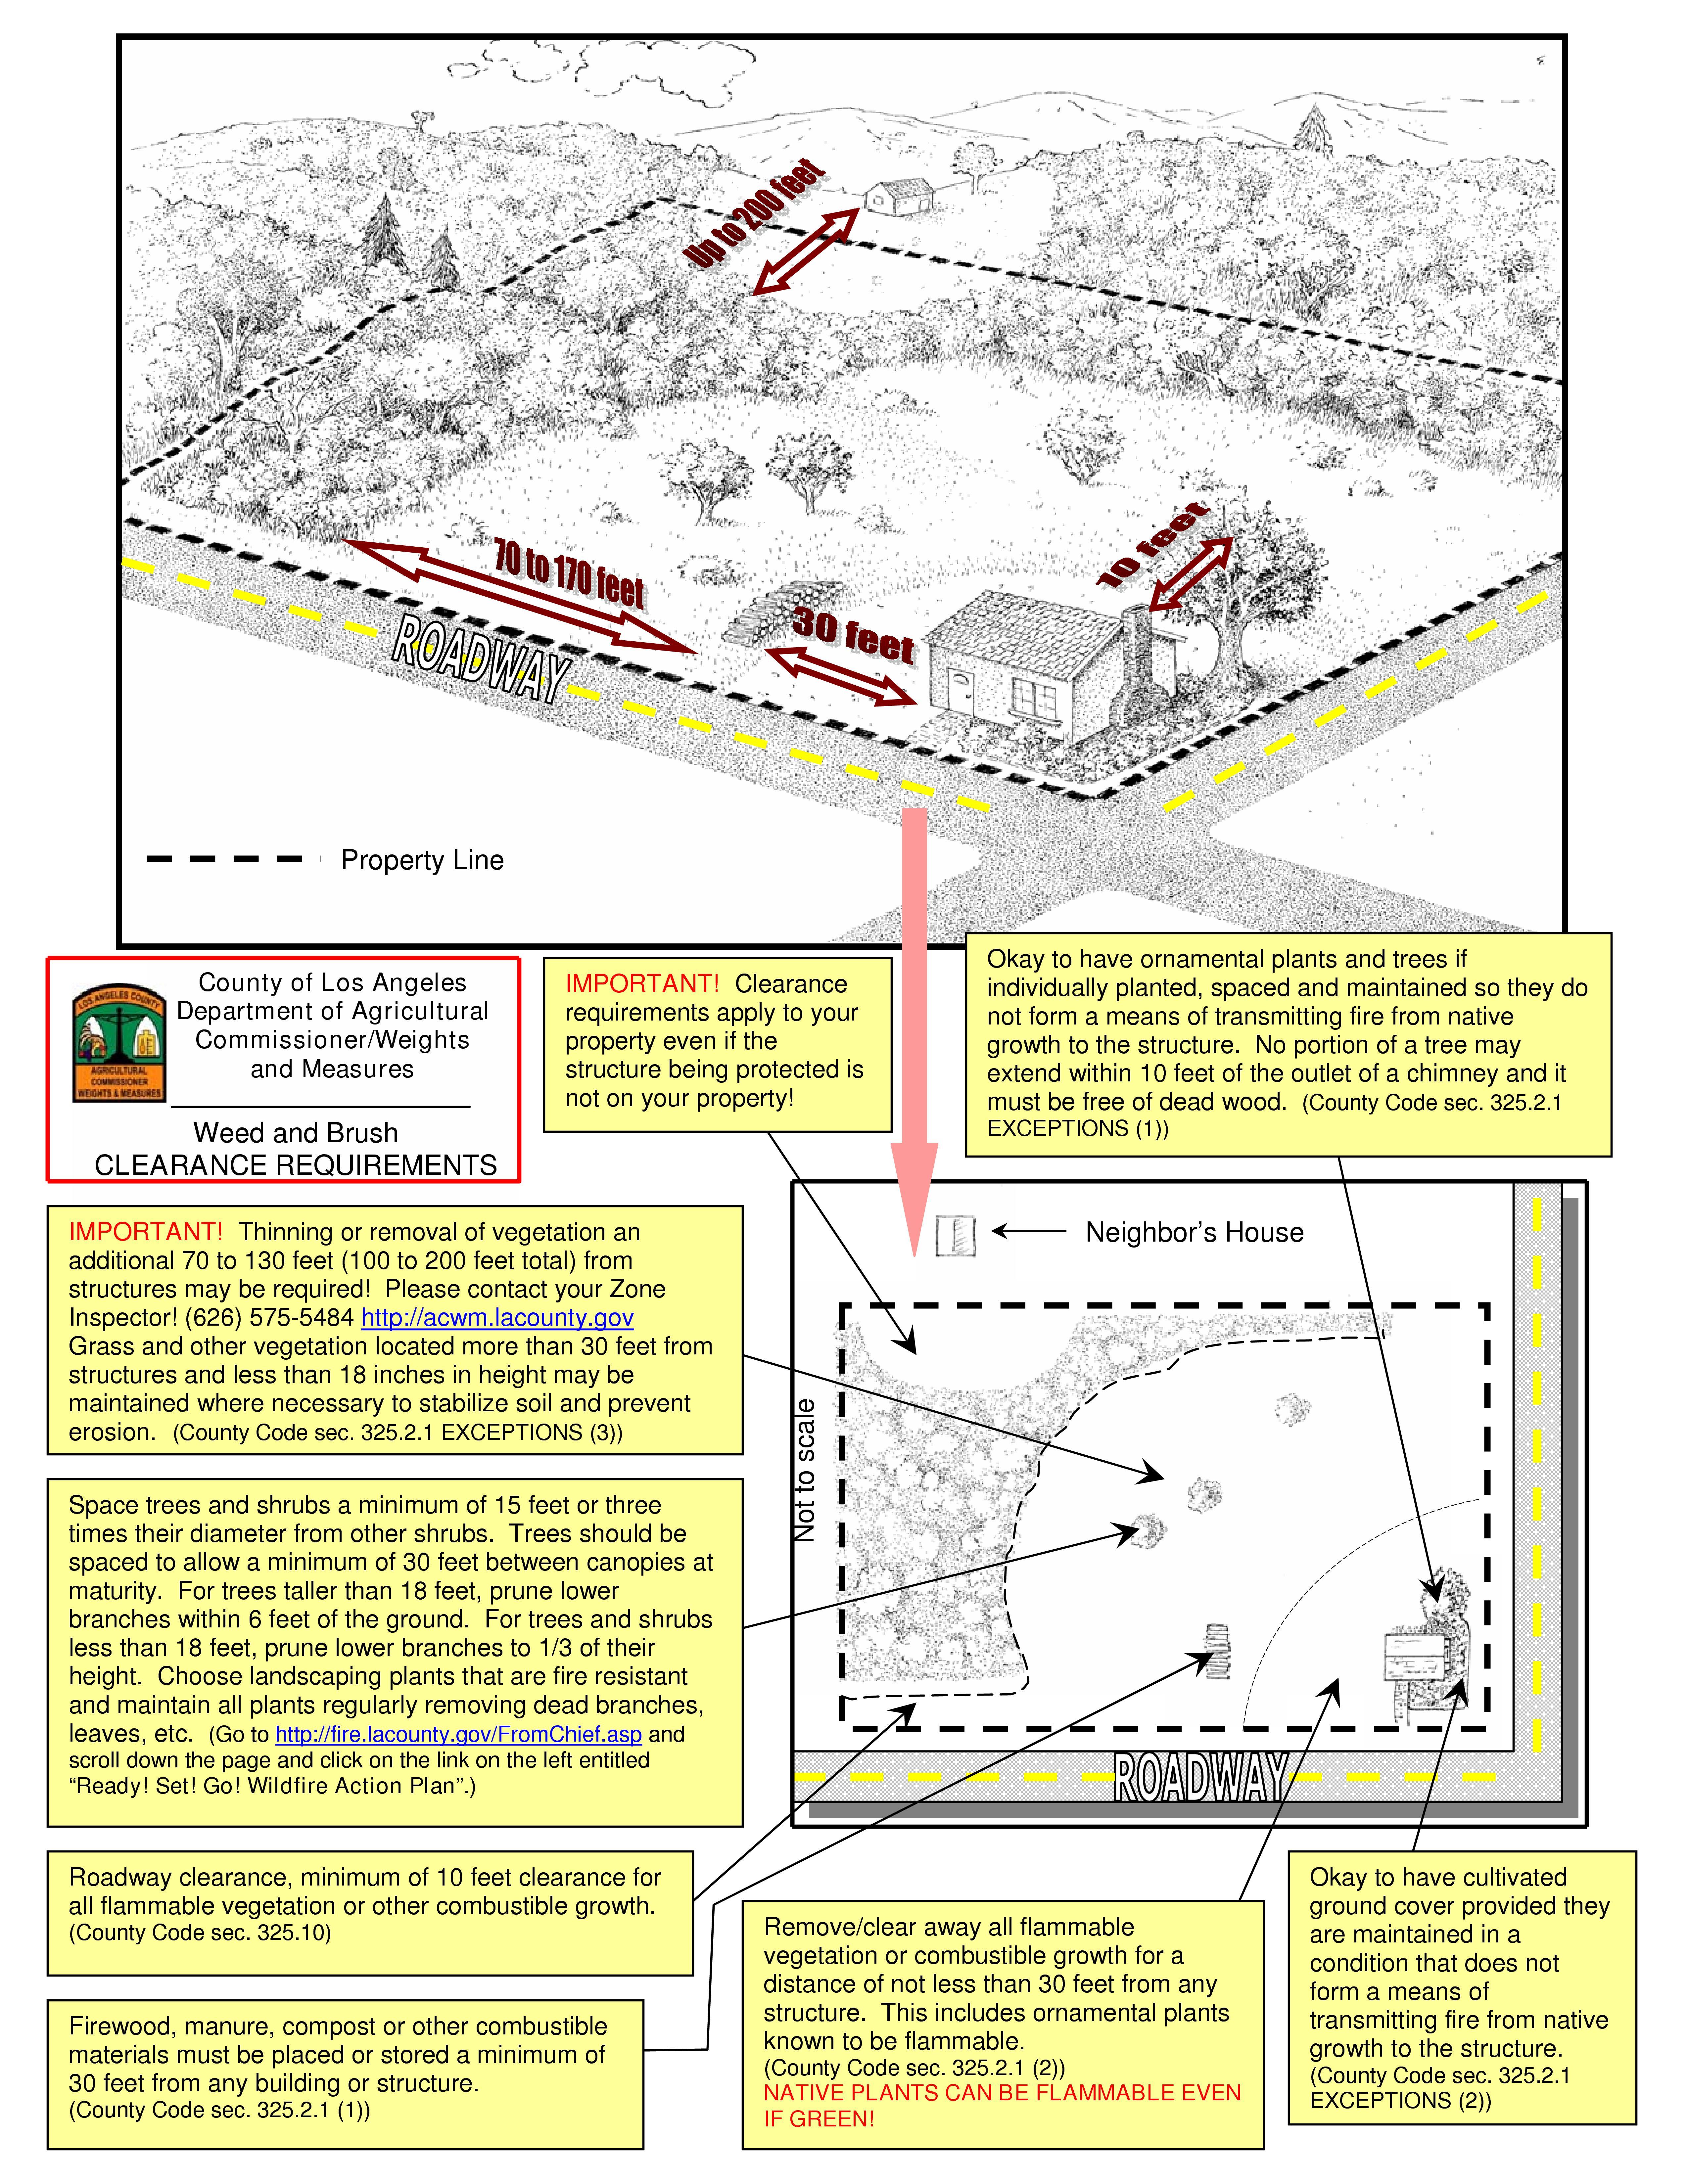 216383_Clearance Map fire season safety habitat authority